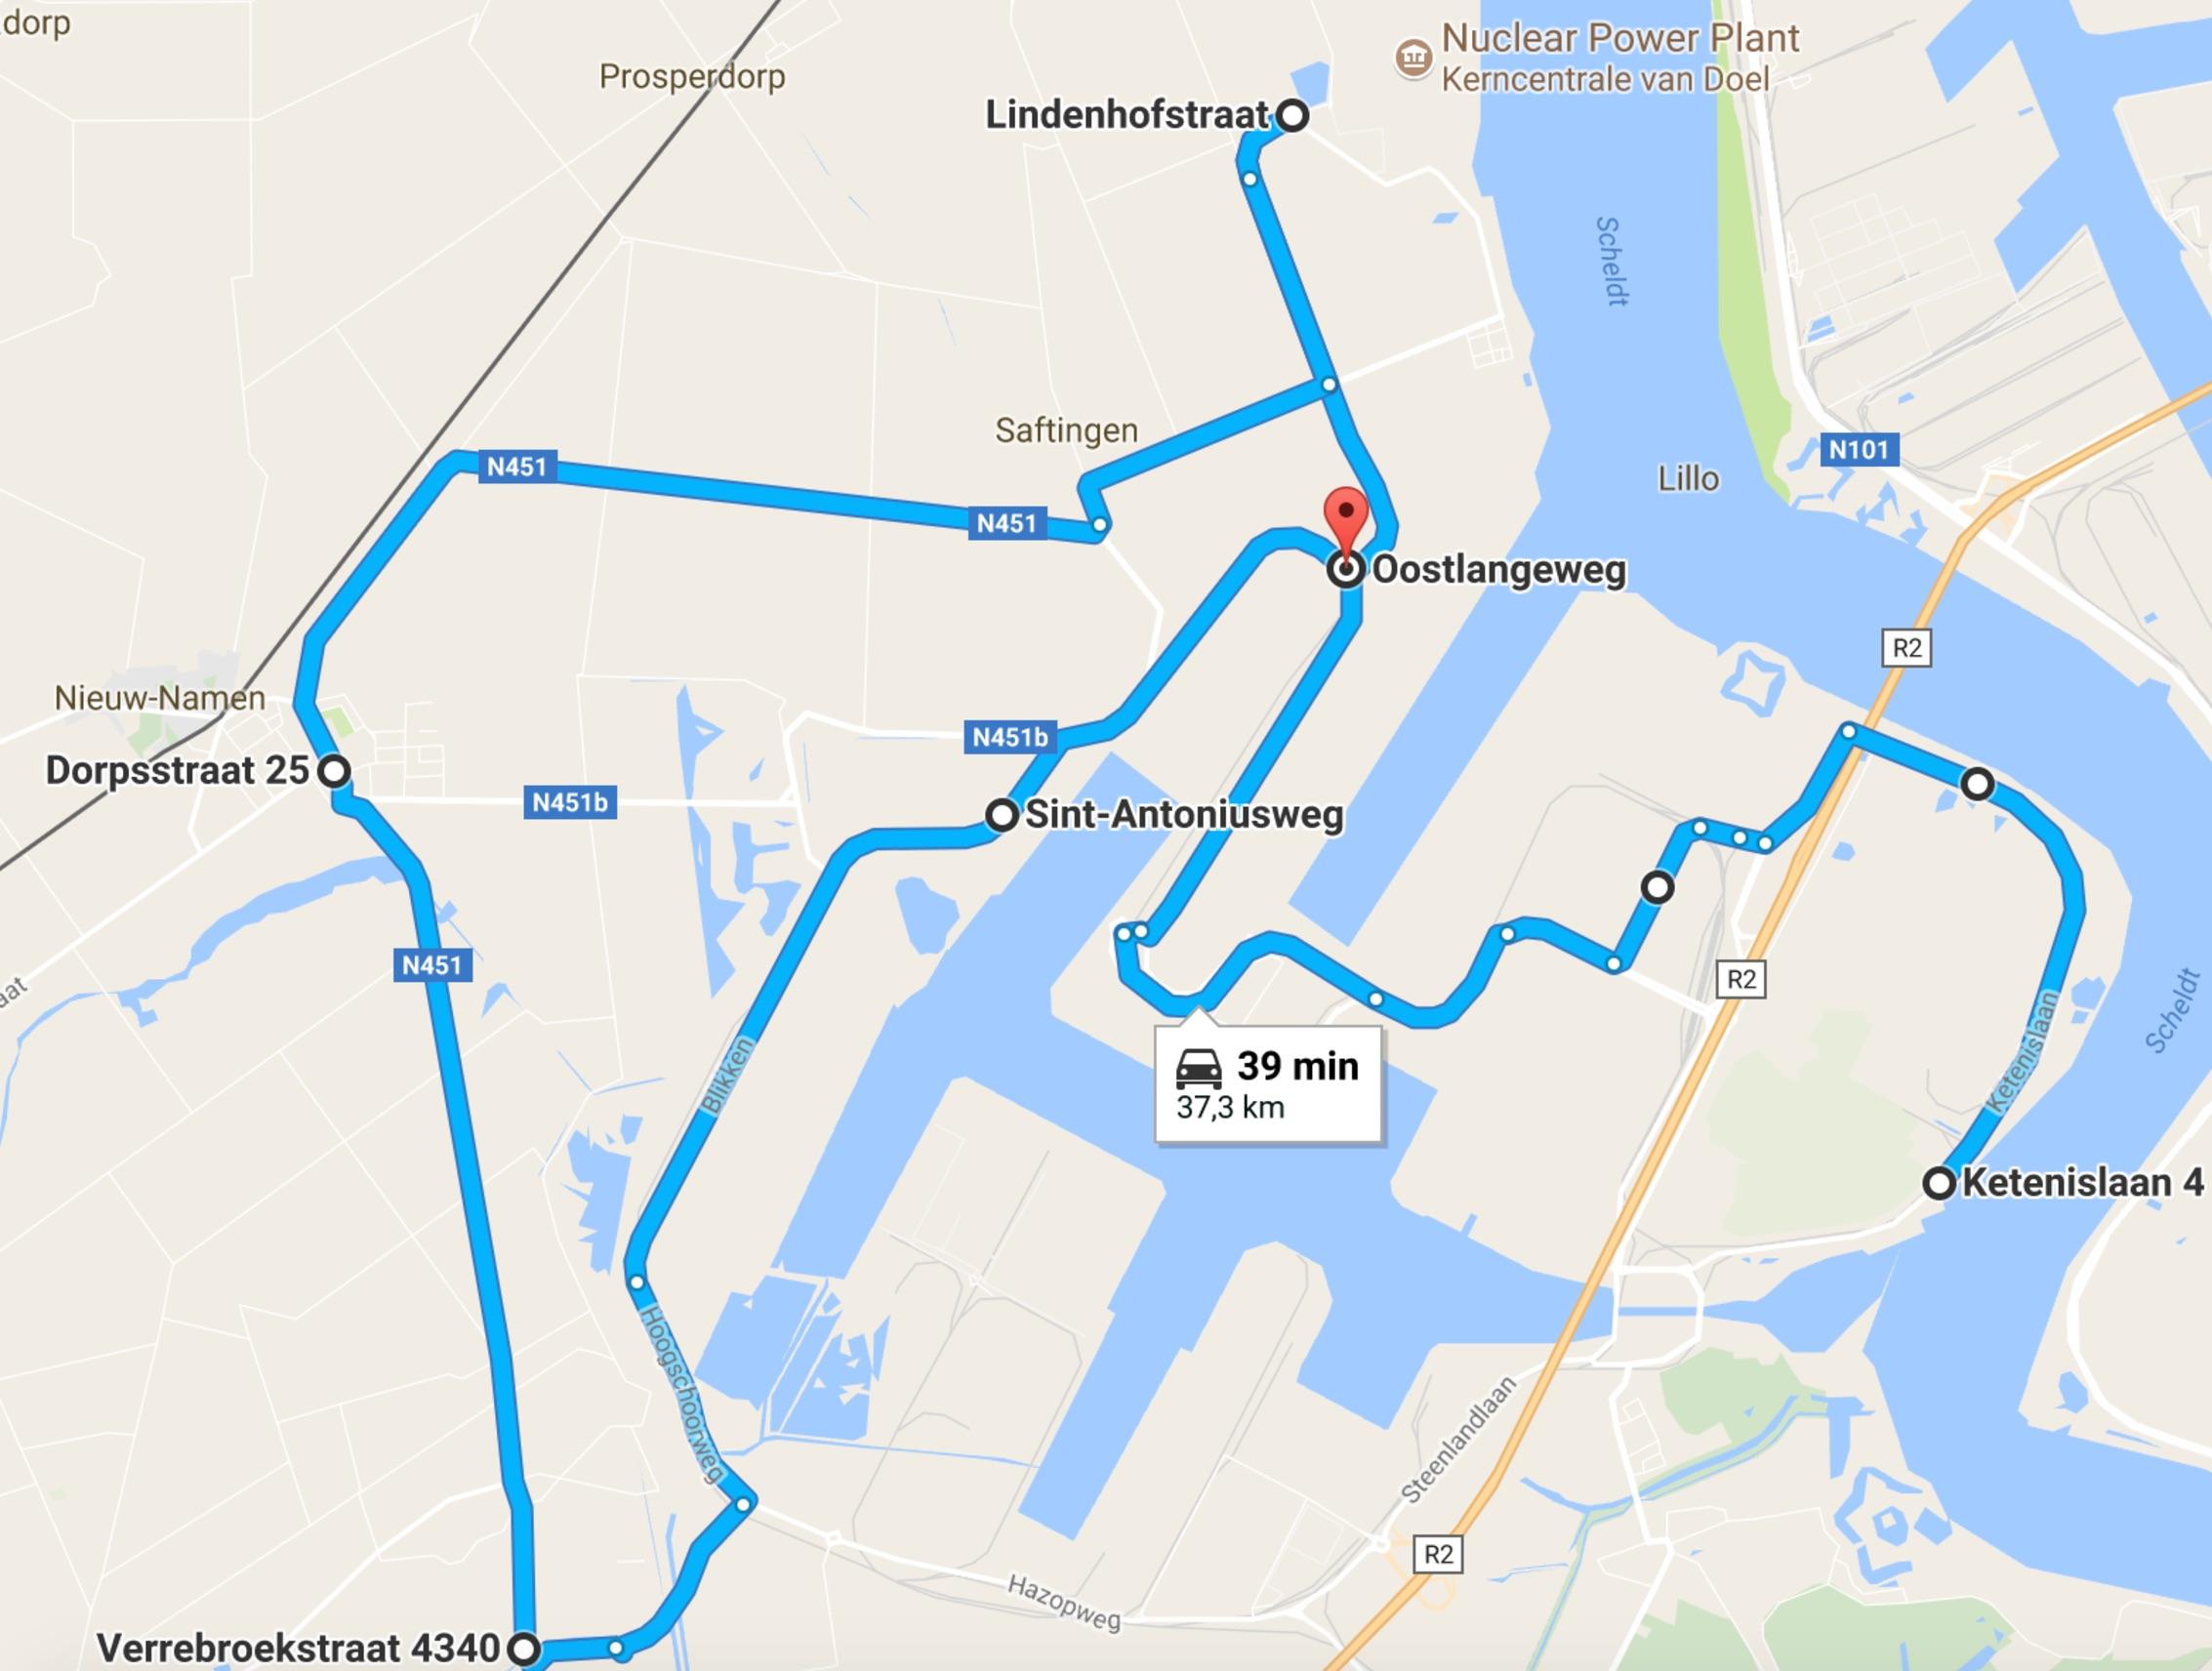 steven-peeters-model-s-p100d-world-record-route